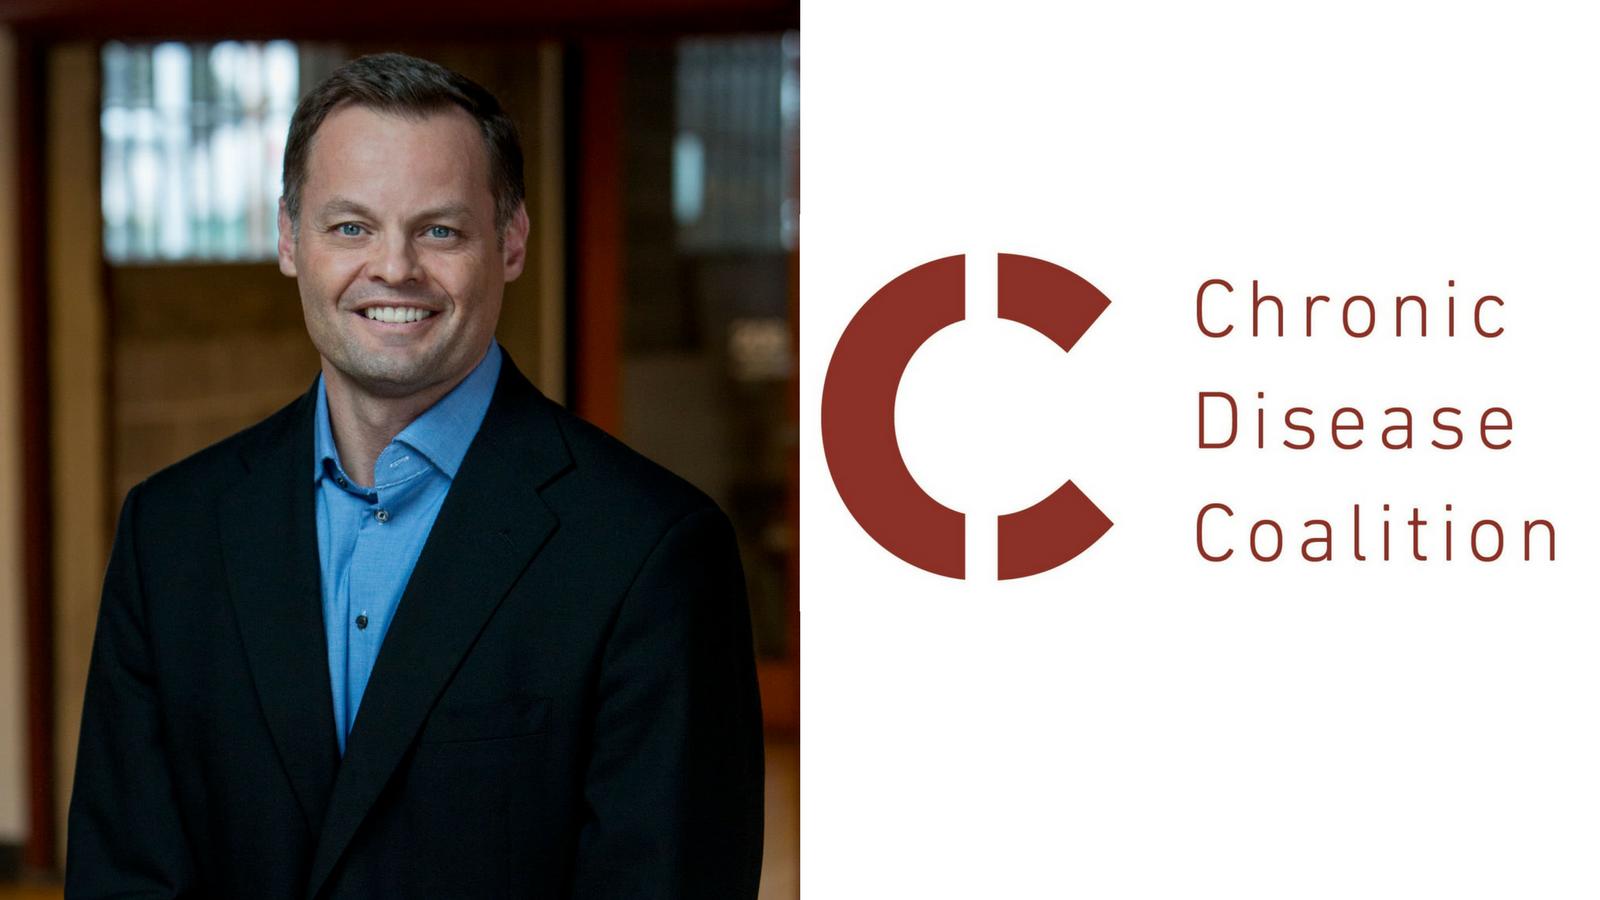 Press Release: Scott Bruun represents American Diabetes Association and Chronic Disease Coalition as peer reviewer for the U.S. Department of Defense Peer Reviewed Medical Research Program